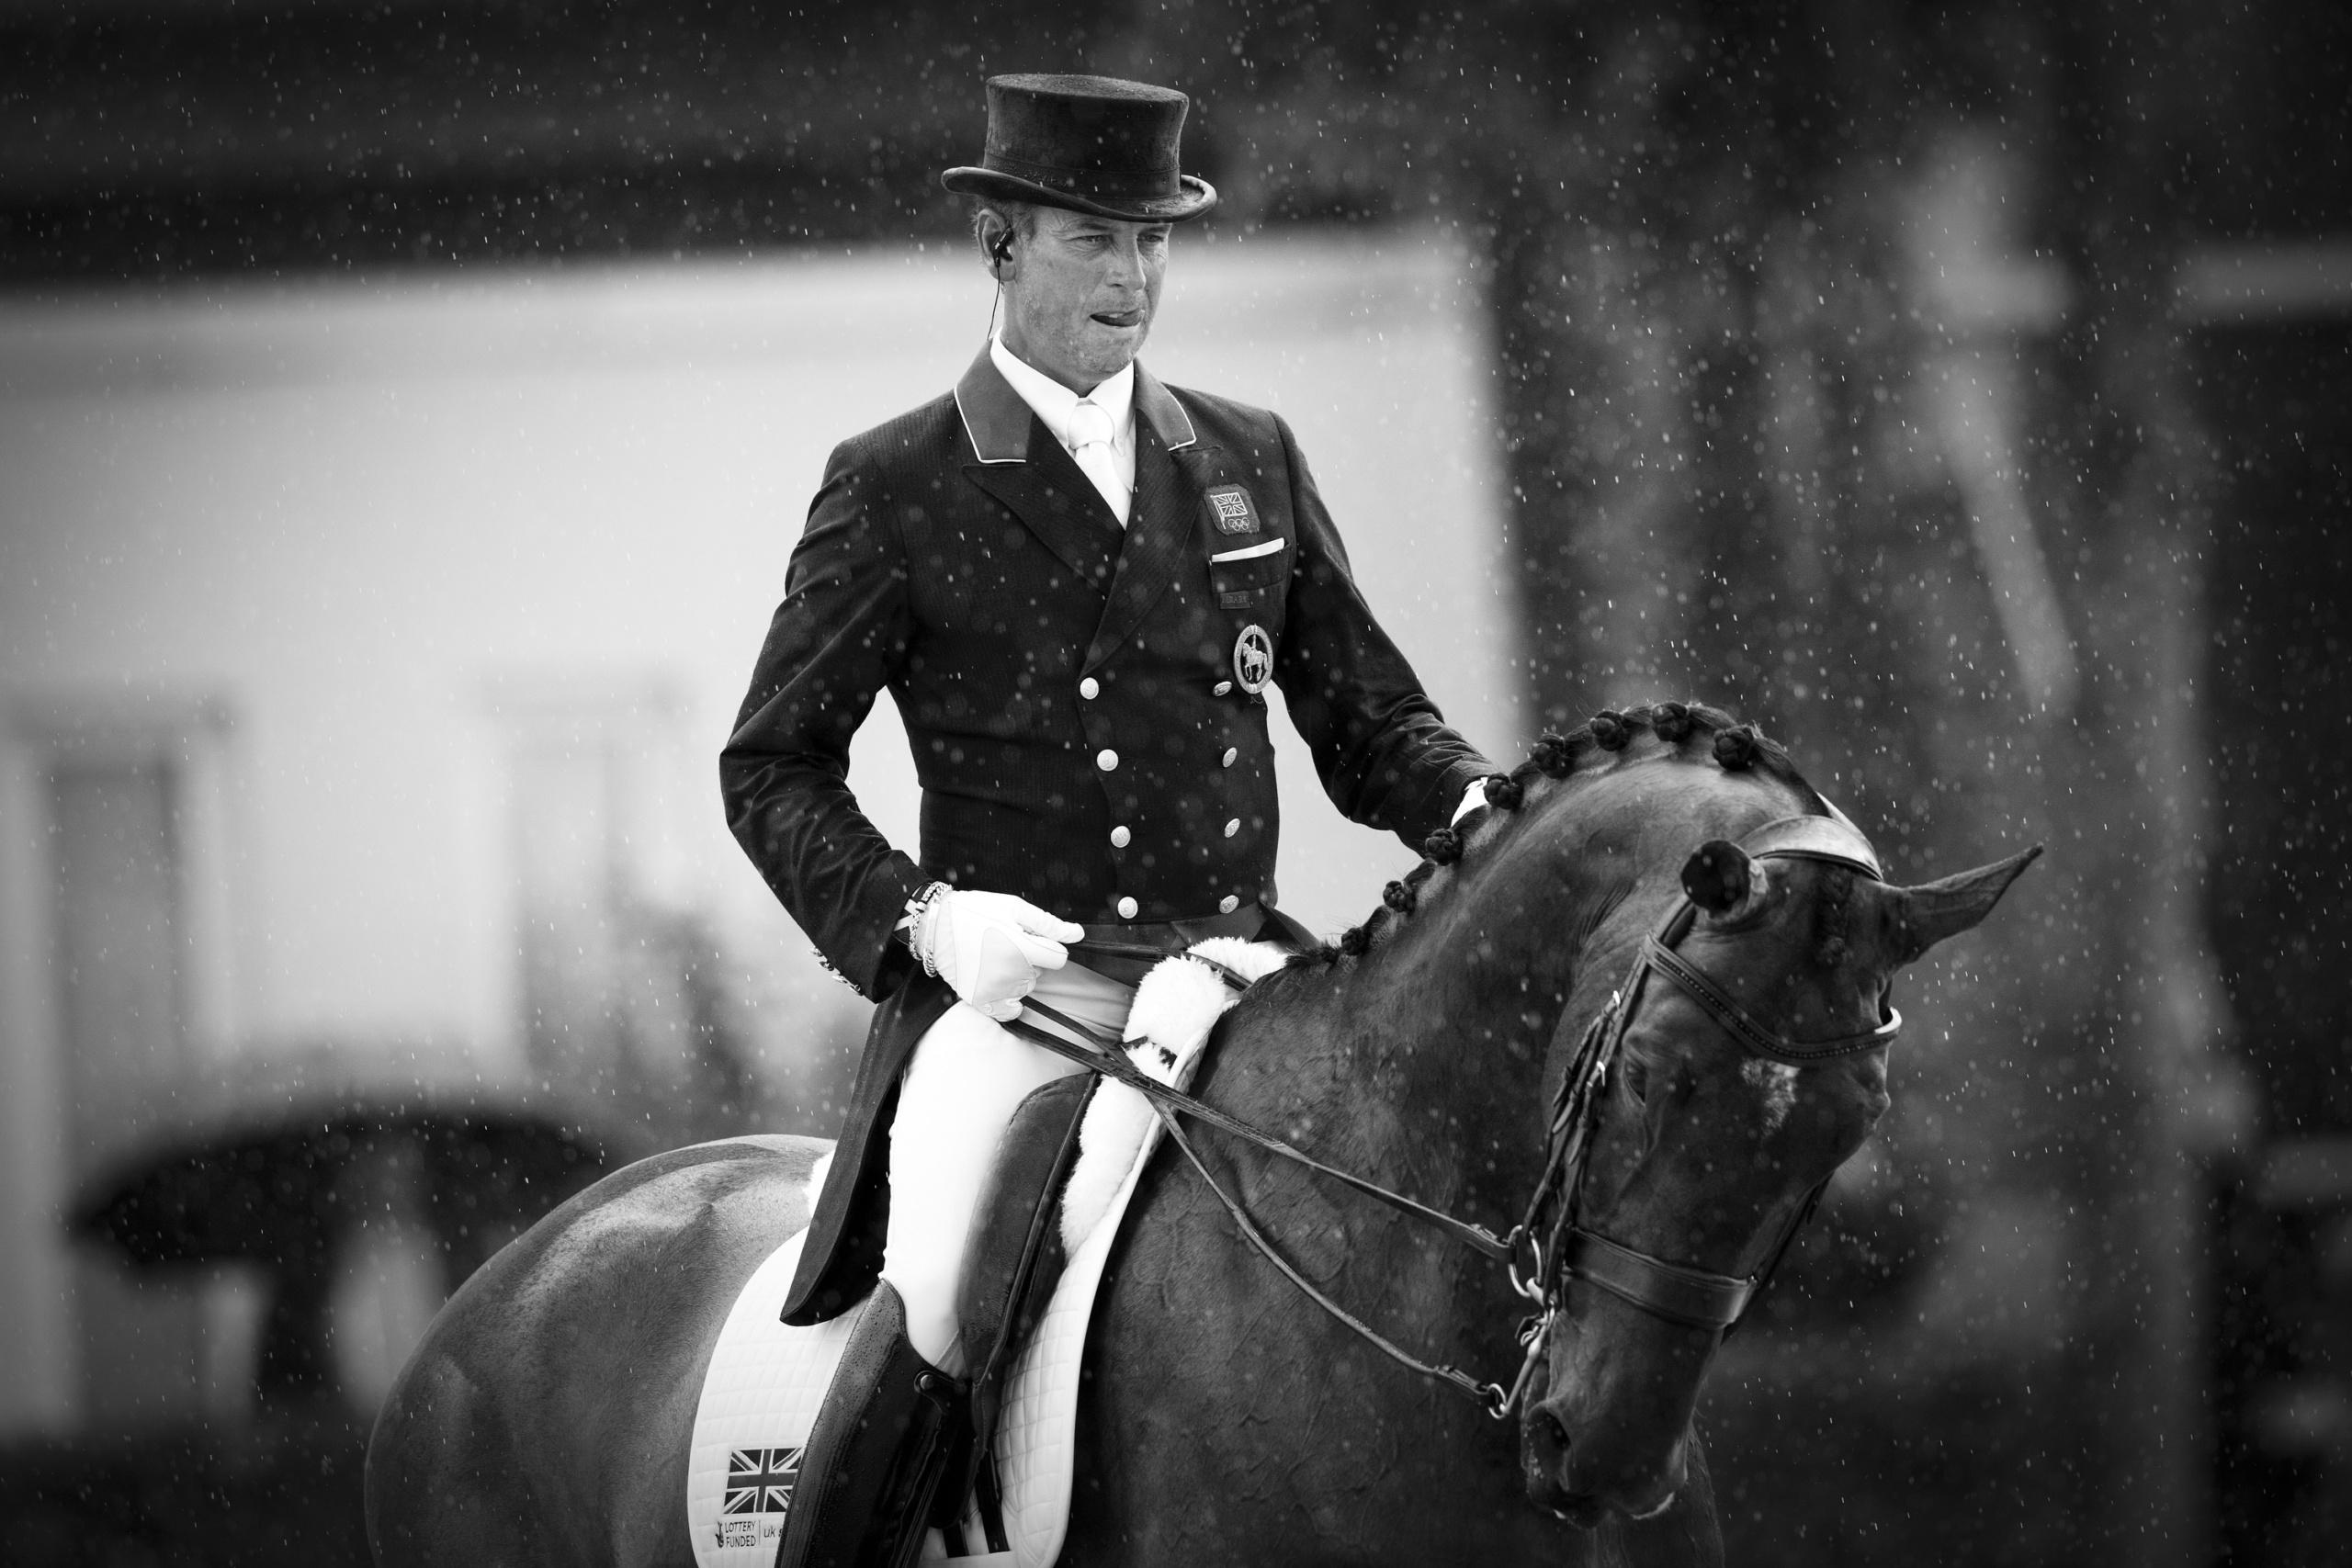 FEI EUROPEAN CHAMPIONSHIPS Aachen 2015. Individual Final Dressage. WARM UP RIDER: CARL HESTER HORSE: NIP TUCK